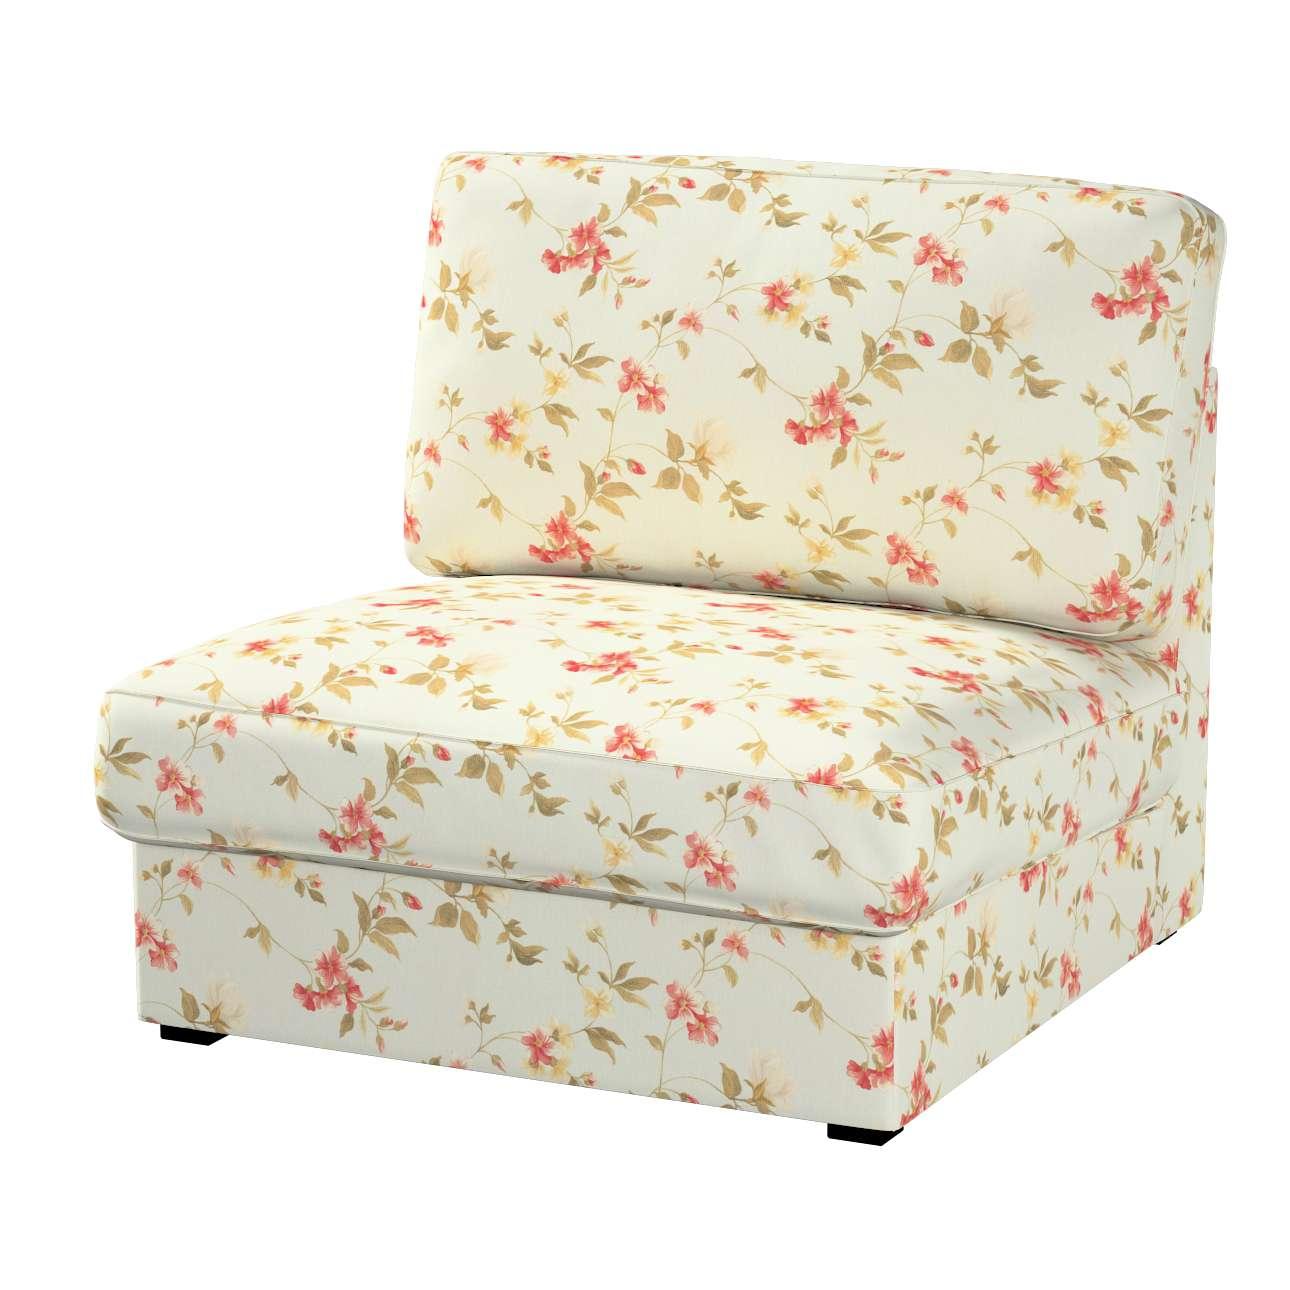 Kivik Sesselbezug Sessel Kivik von der Kollektion Londres, Stoff: 124-65